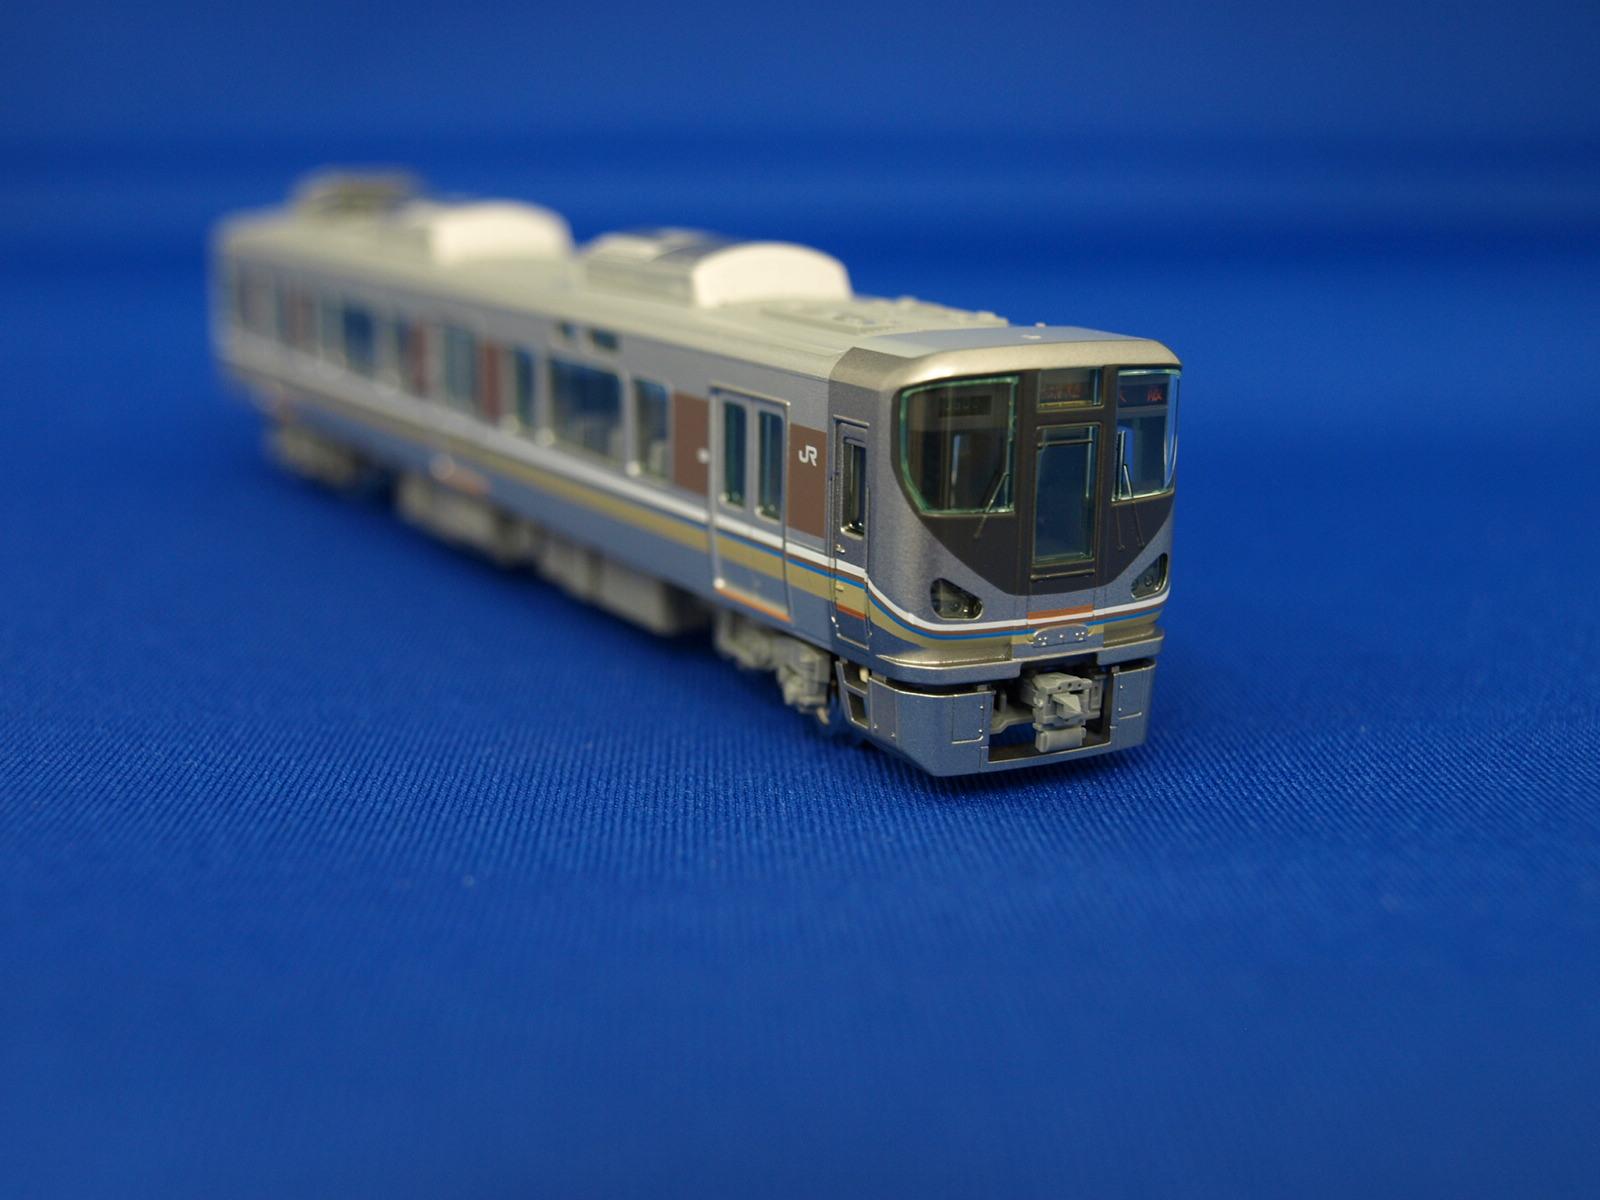 Nゲージ トミックス 98607 98607 JR JR Nゲージ 225-6000系近郊電車(4両編成)セット, イカグン:415f639f --- officewill.xsrv.jp